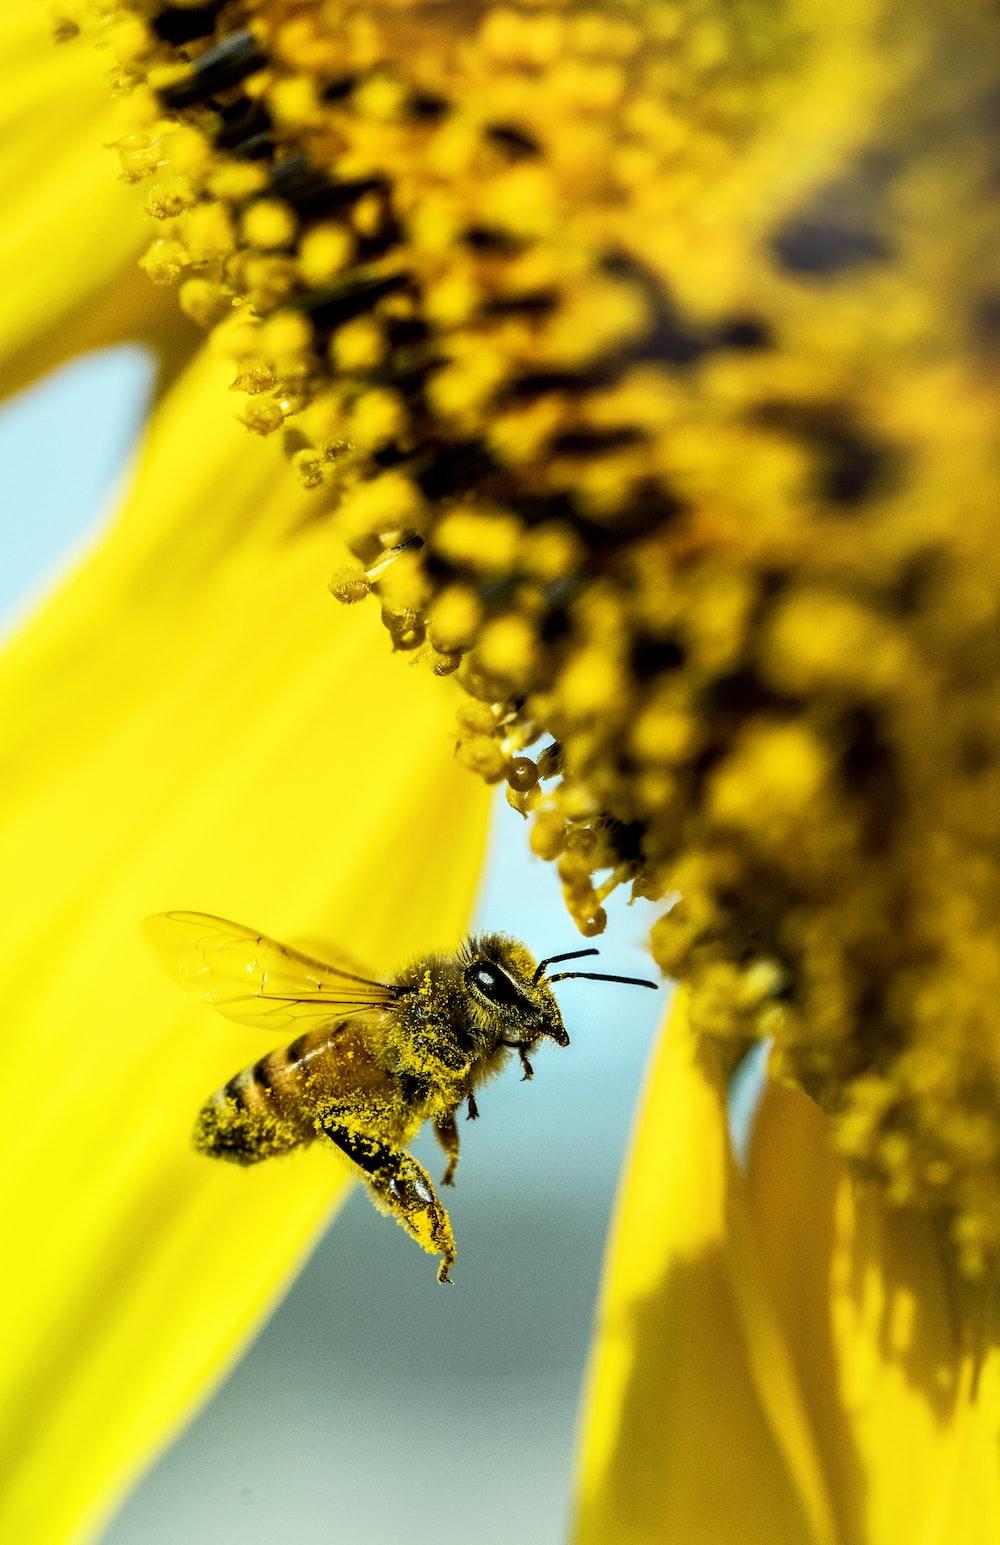 yellow bee flying beside flower